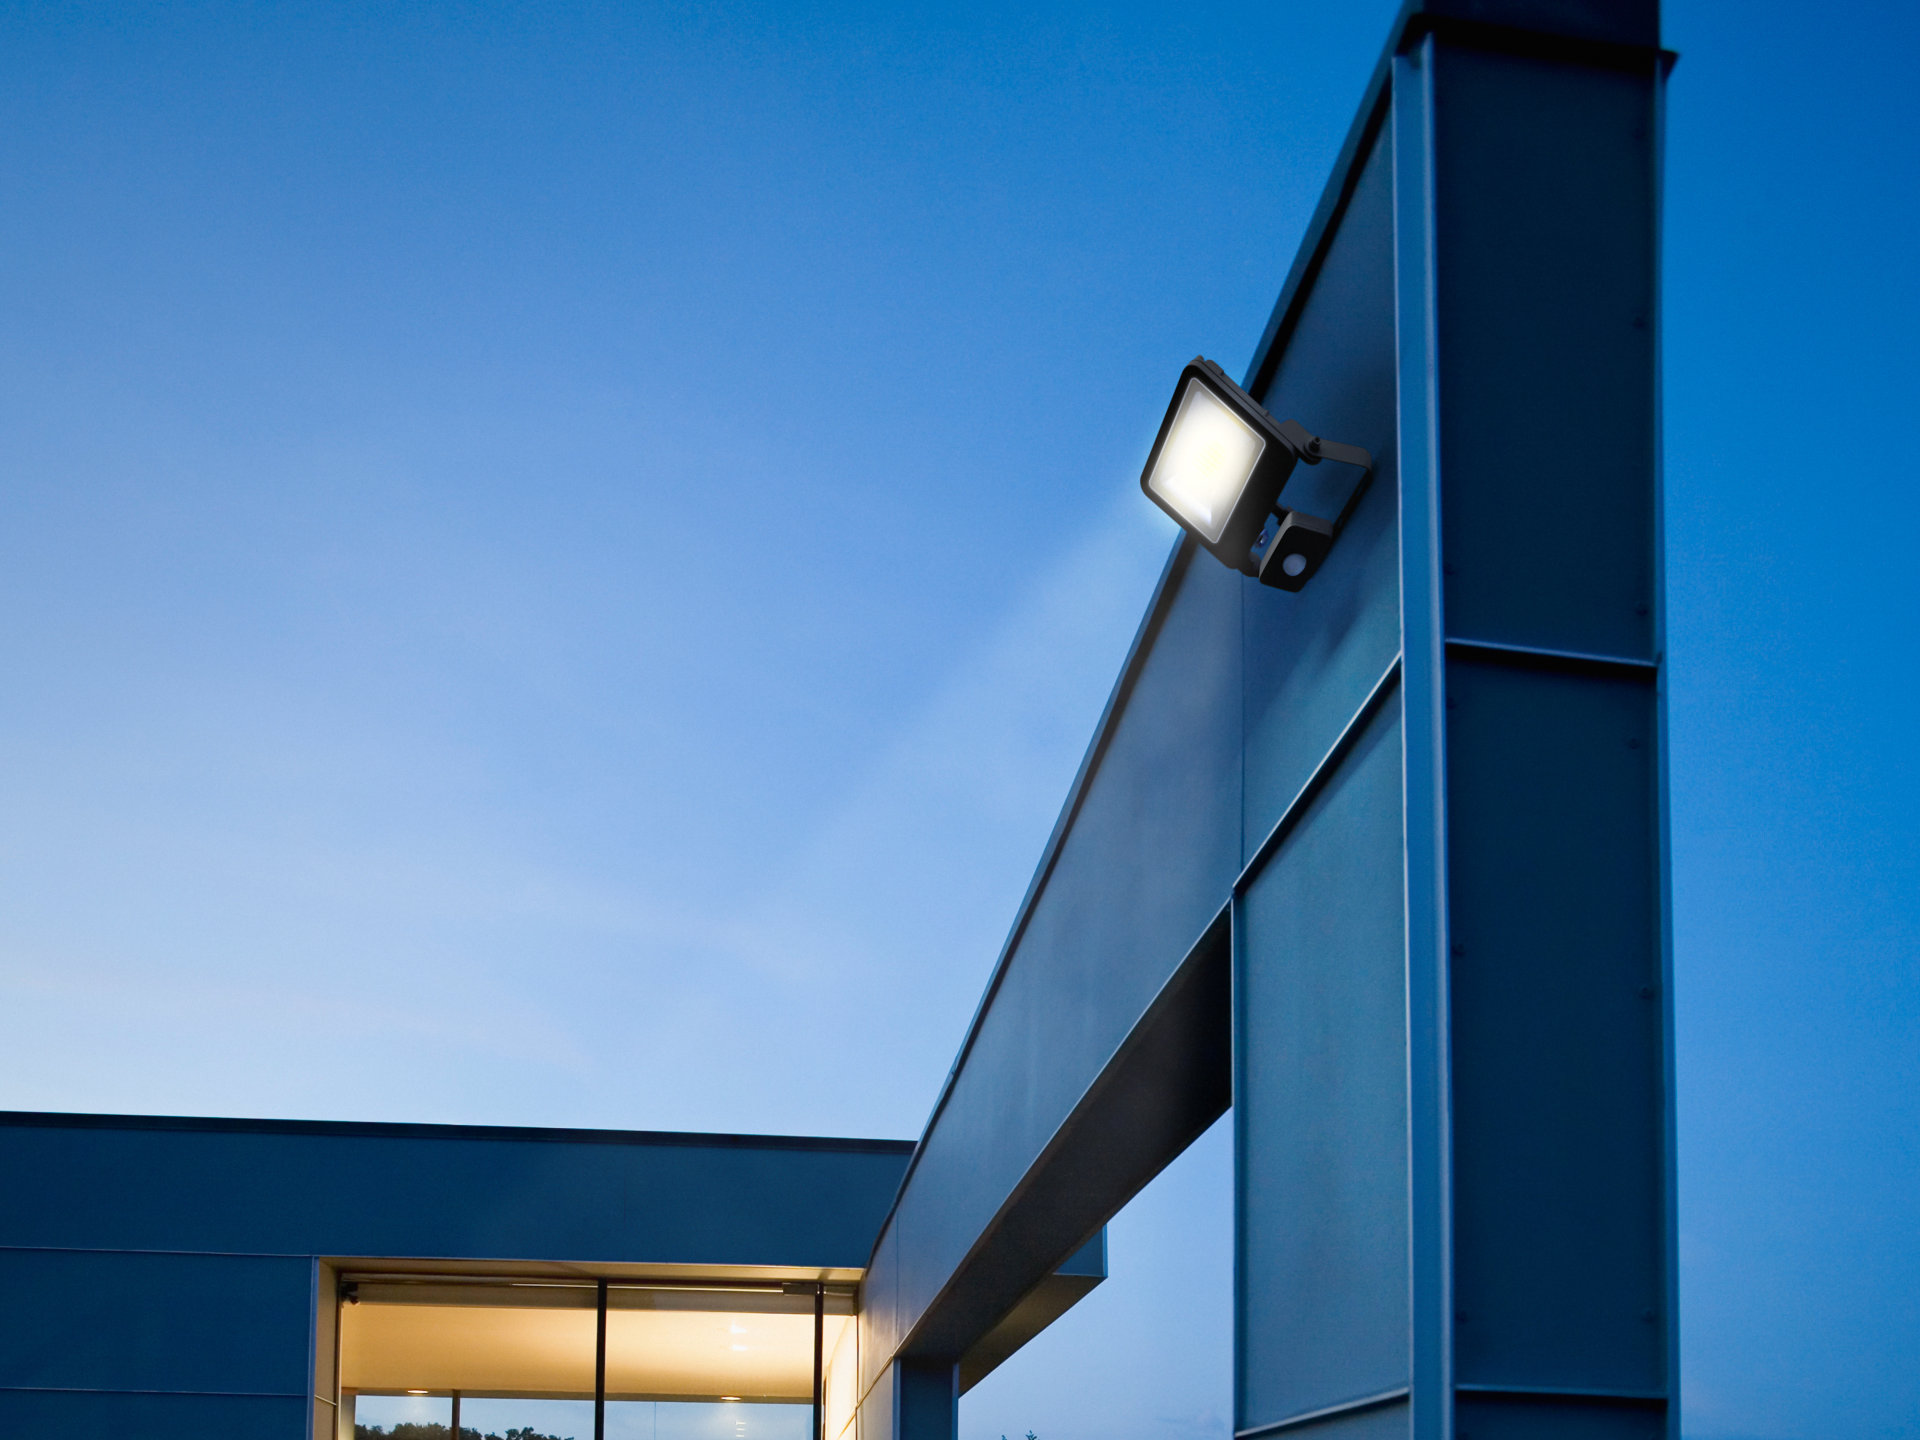 LED Floodlight business premises